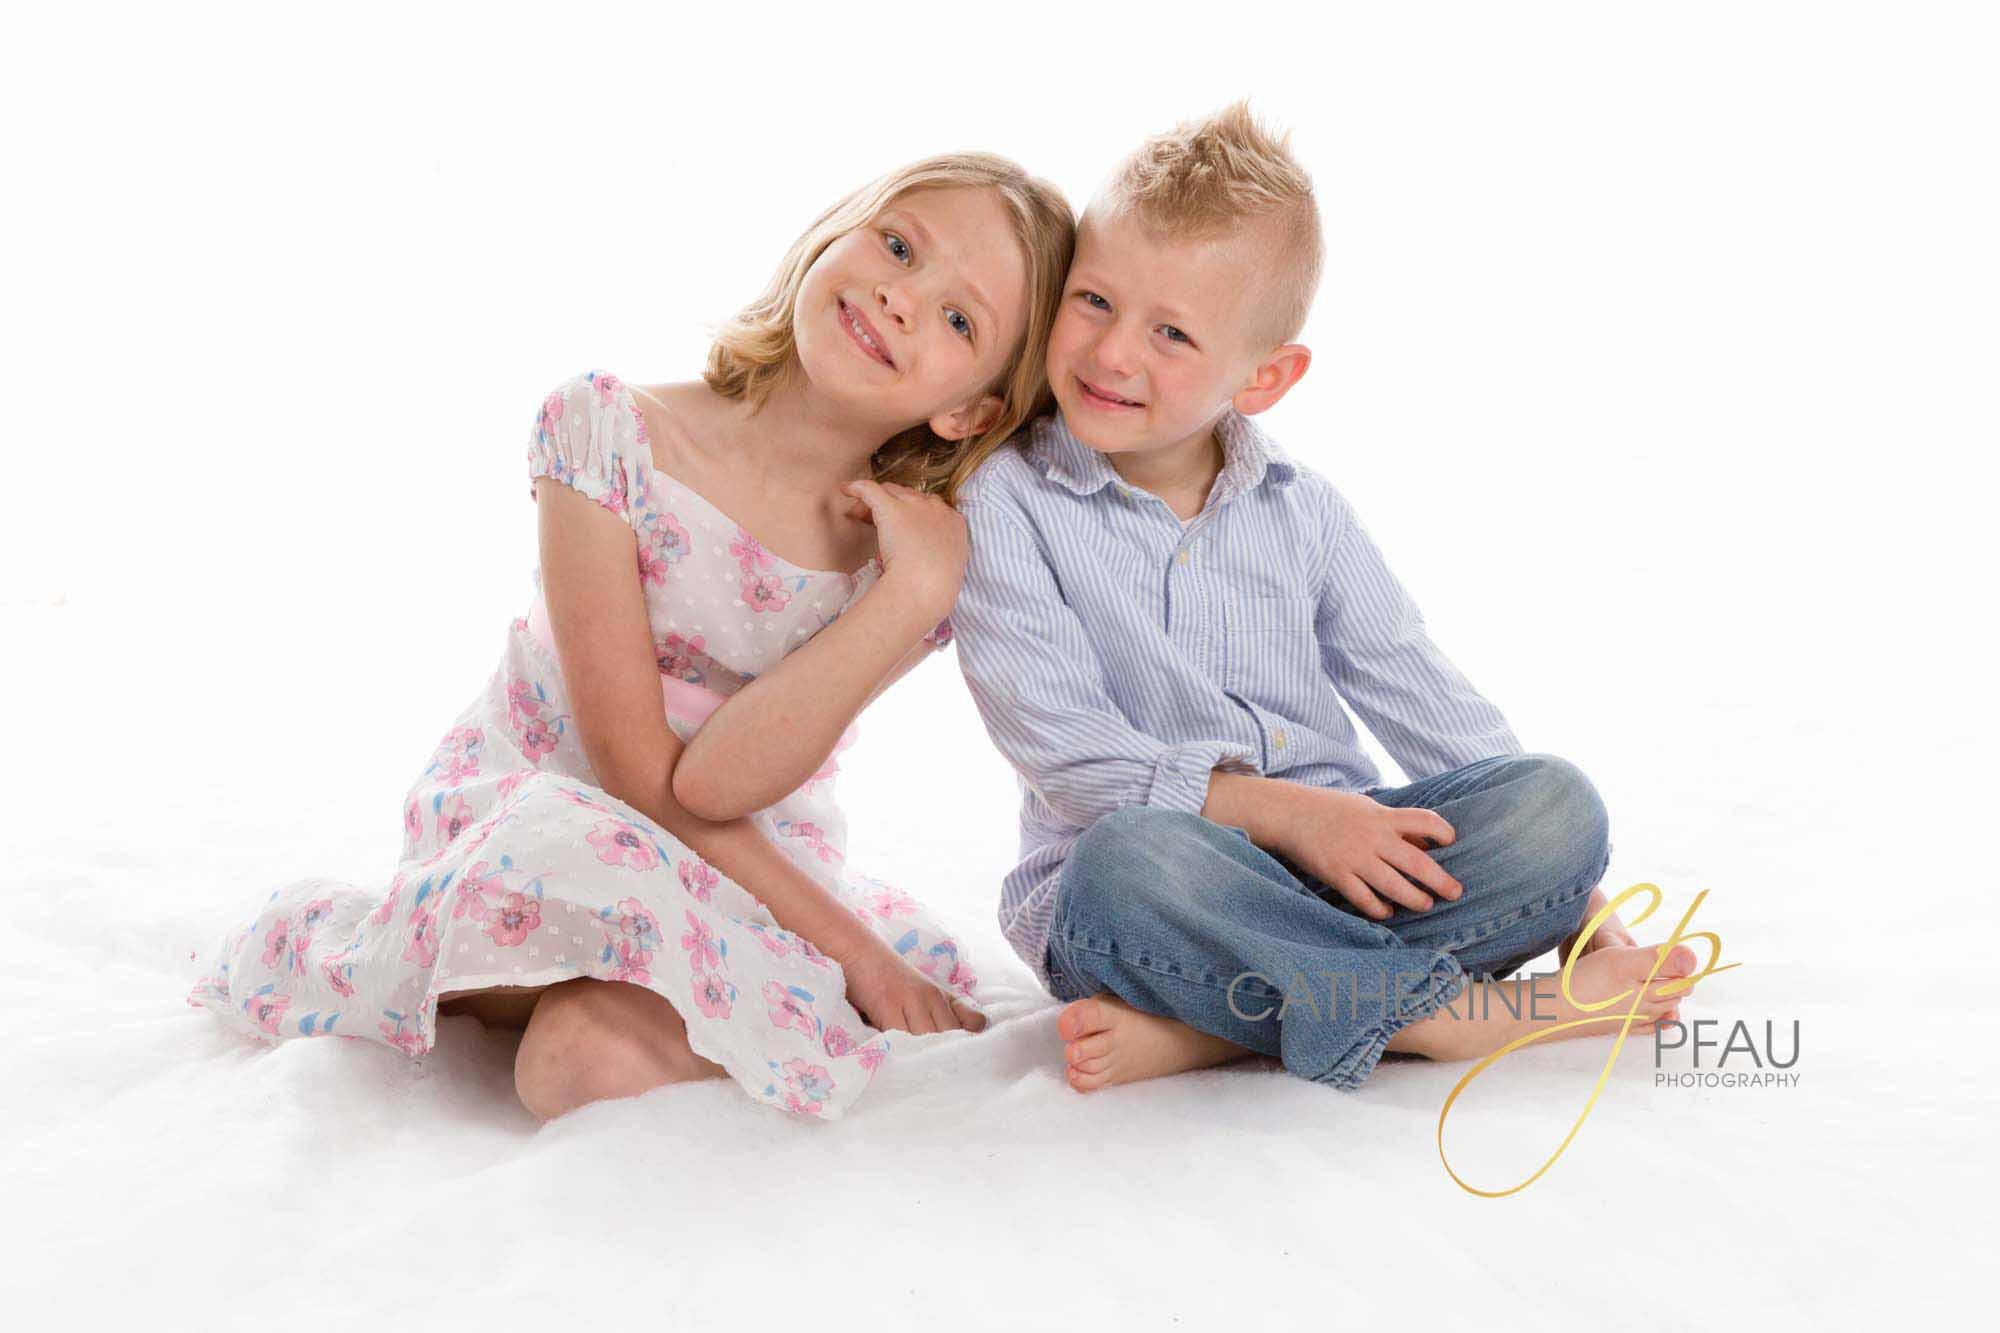 catherinepfauphotography_familyportrait_children_photography-11.jpg